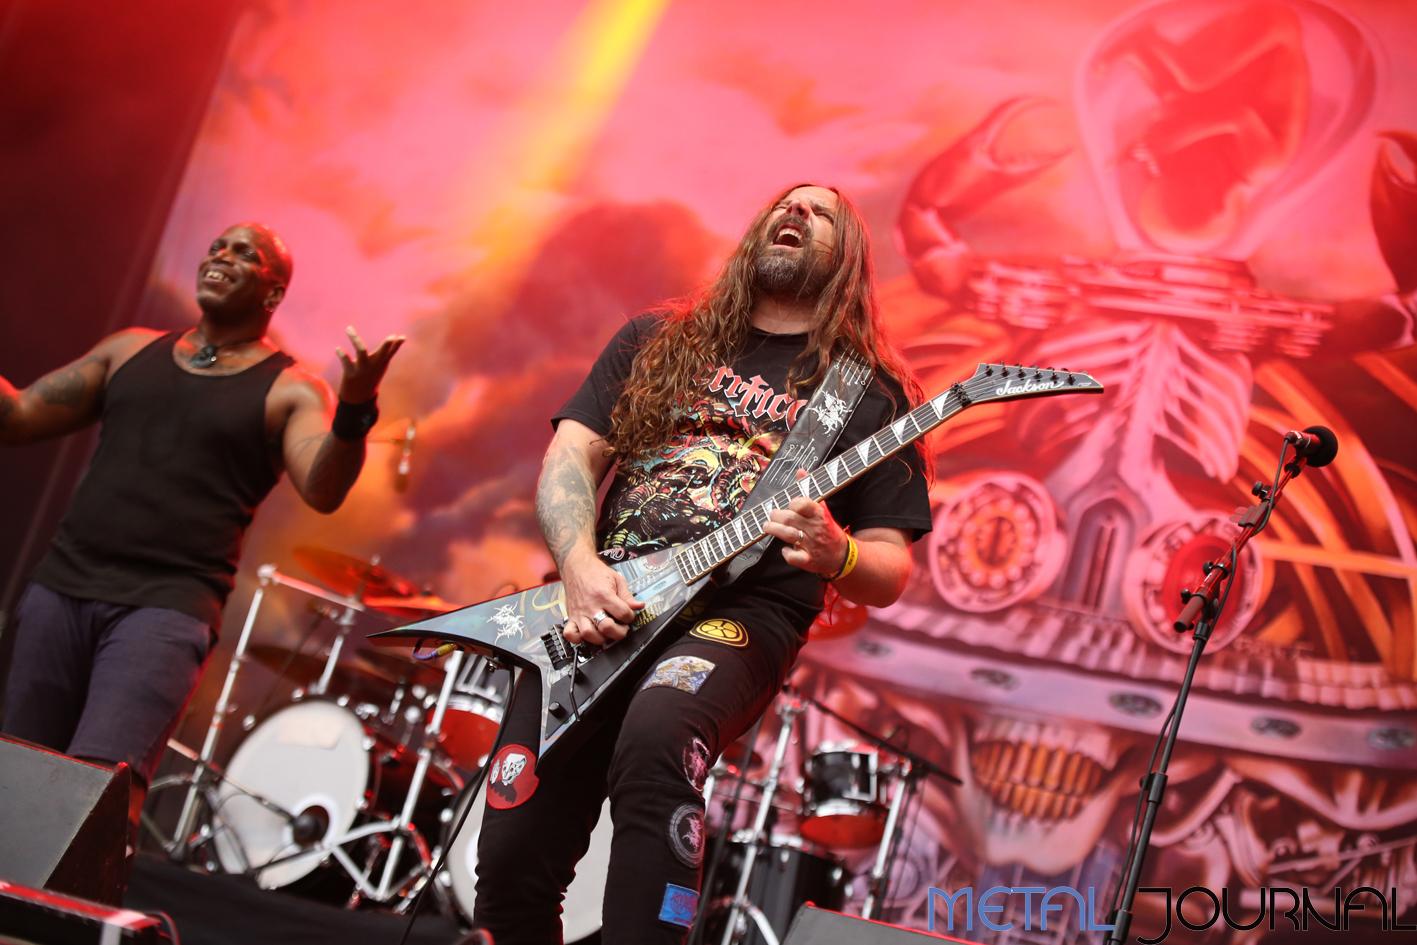 sepultura - leyendas del rock 2018 pic 1